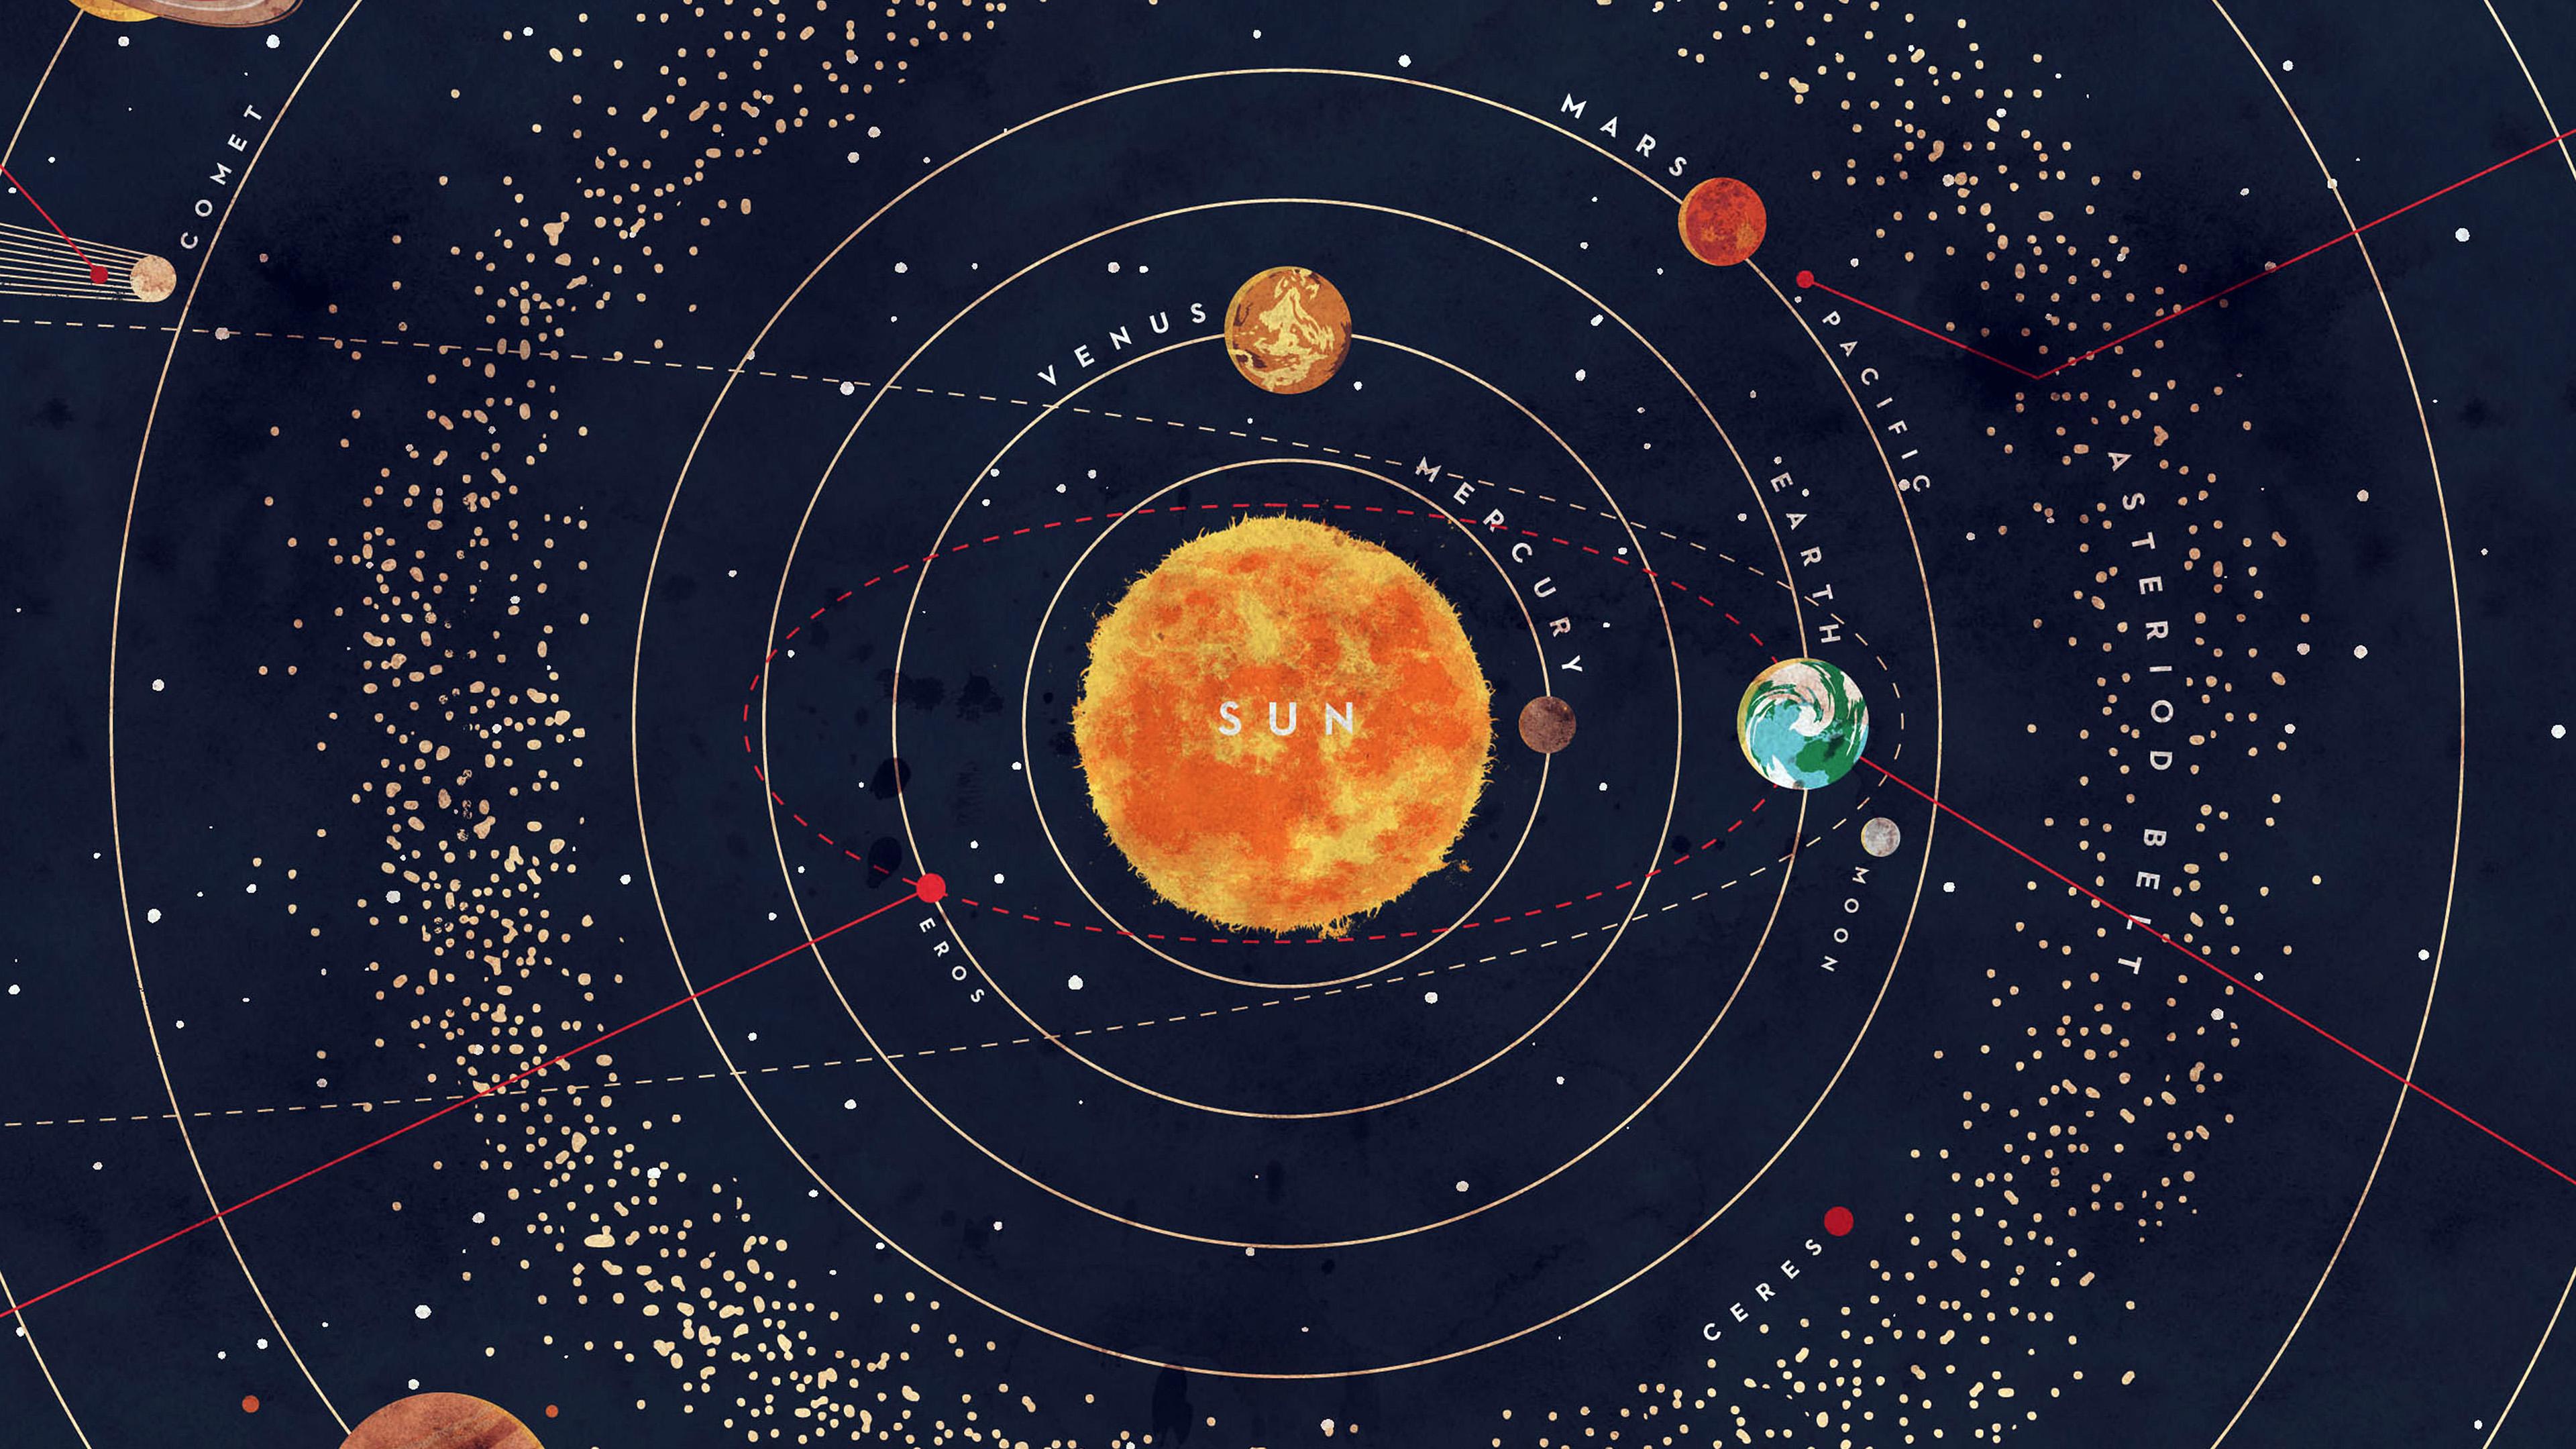 Solar System Wallpaper Hd Wallpaper For Desktop Laptop Ar63 Solar System Space